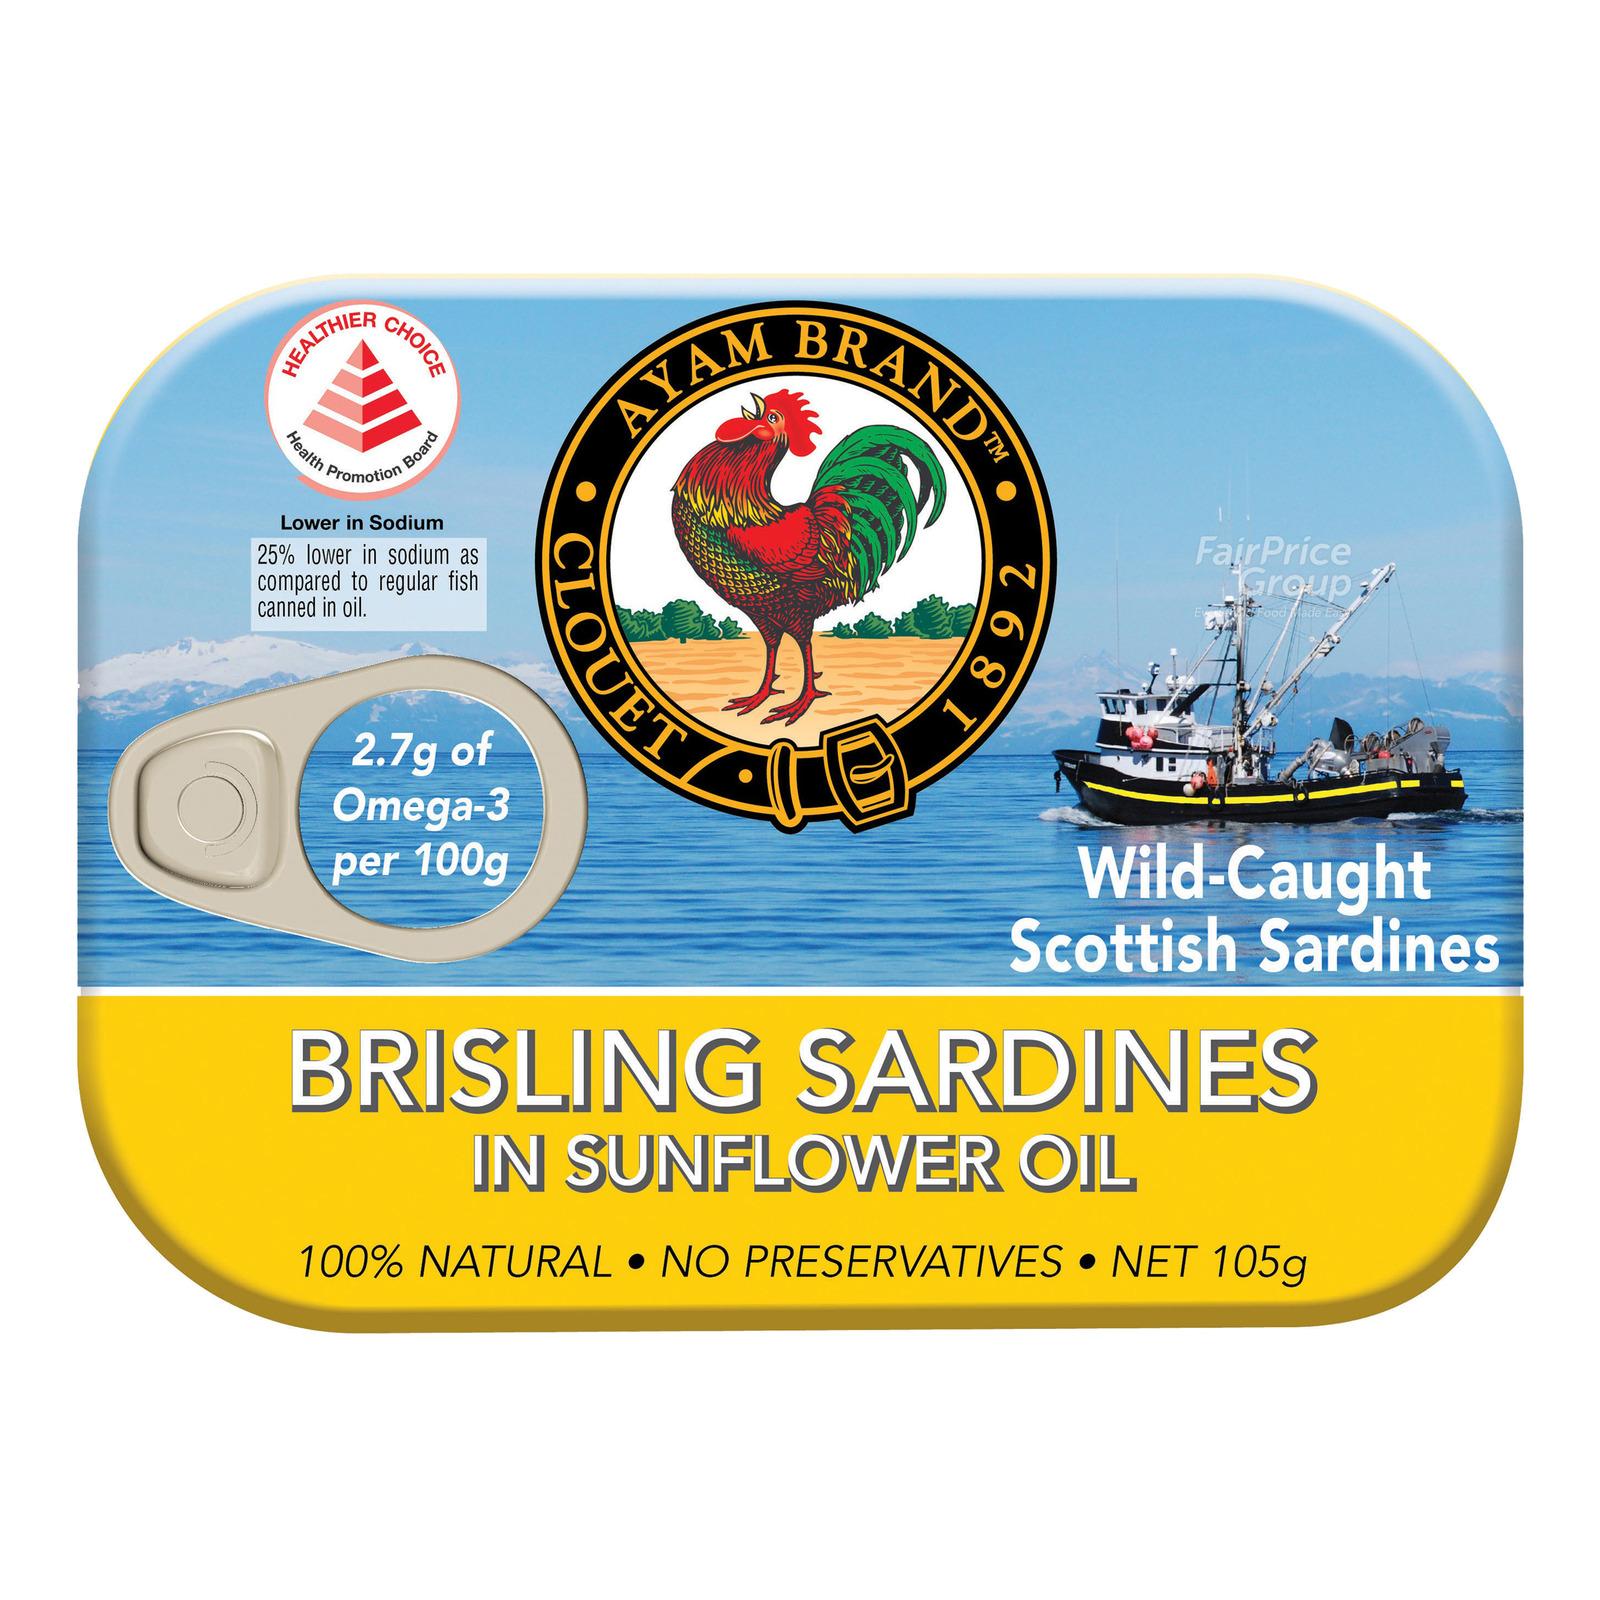 Ayam Brand Brisling Sardines - Sunflower Oil